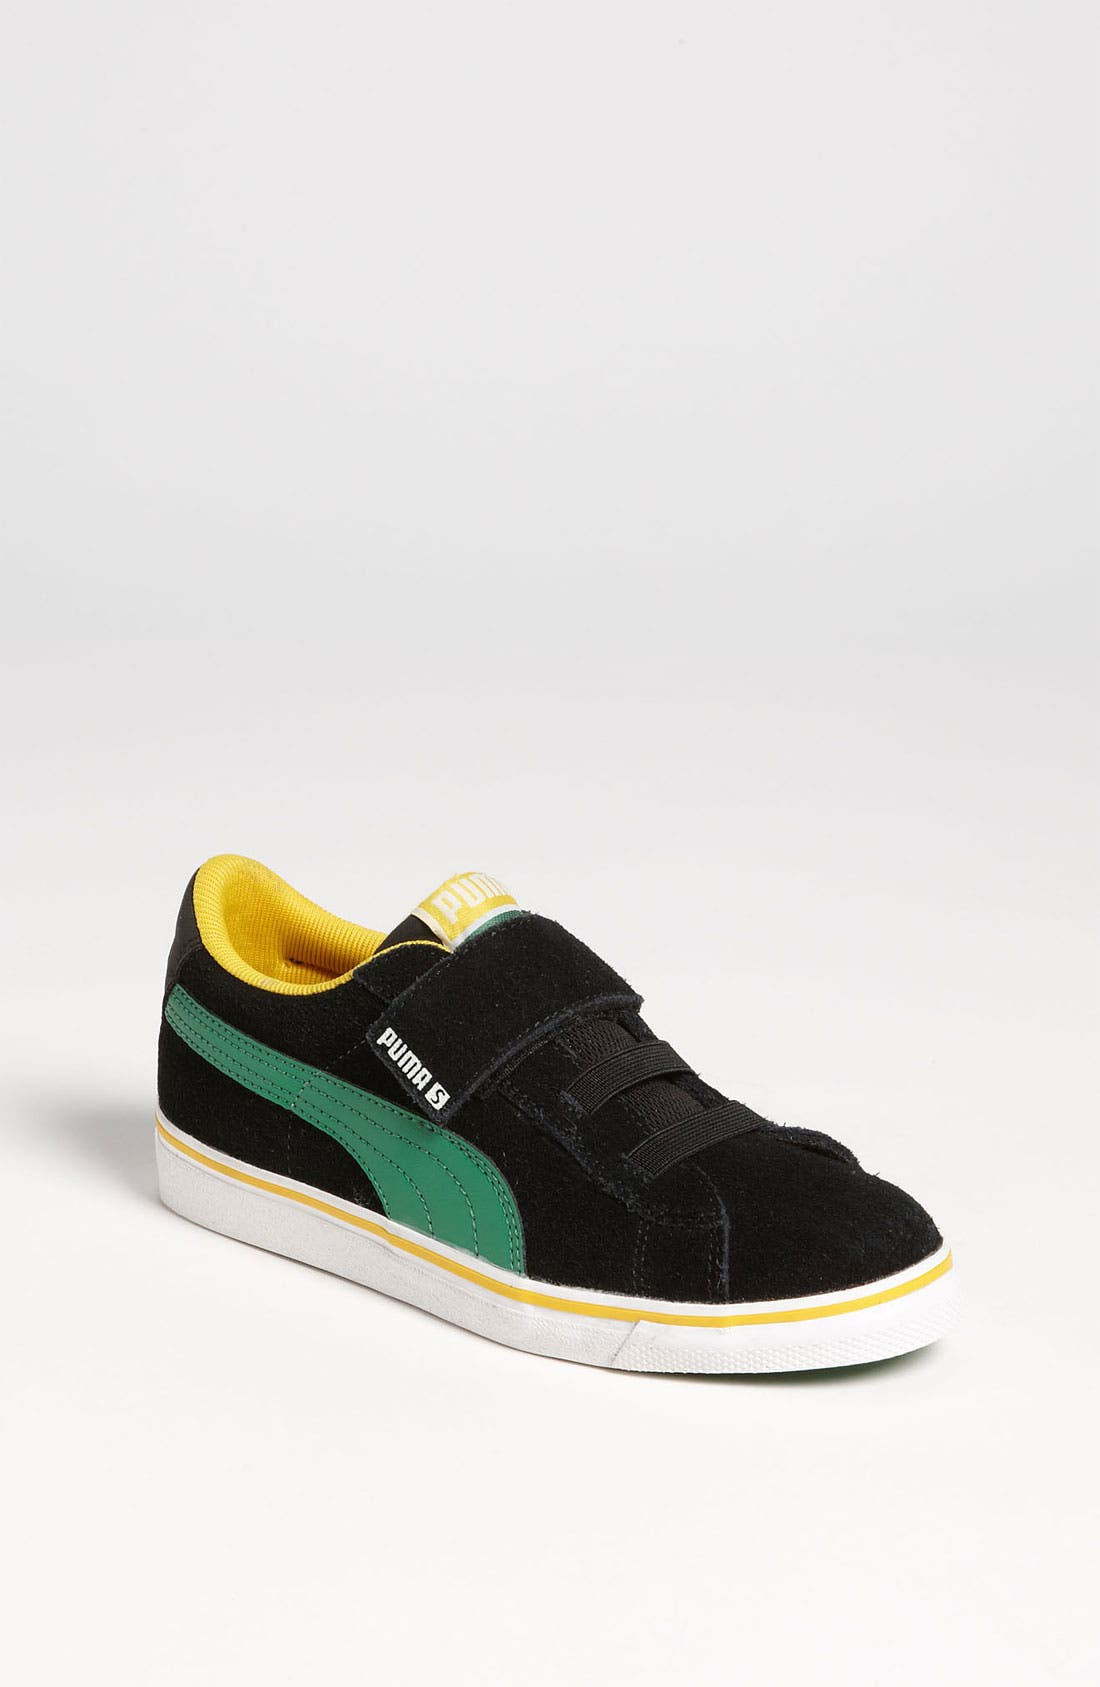 Main Image - PUMA 'S Vulc V' Sneaker (Baby, Walker & Toddler)